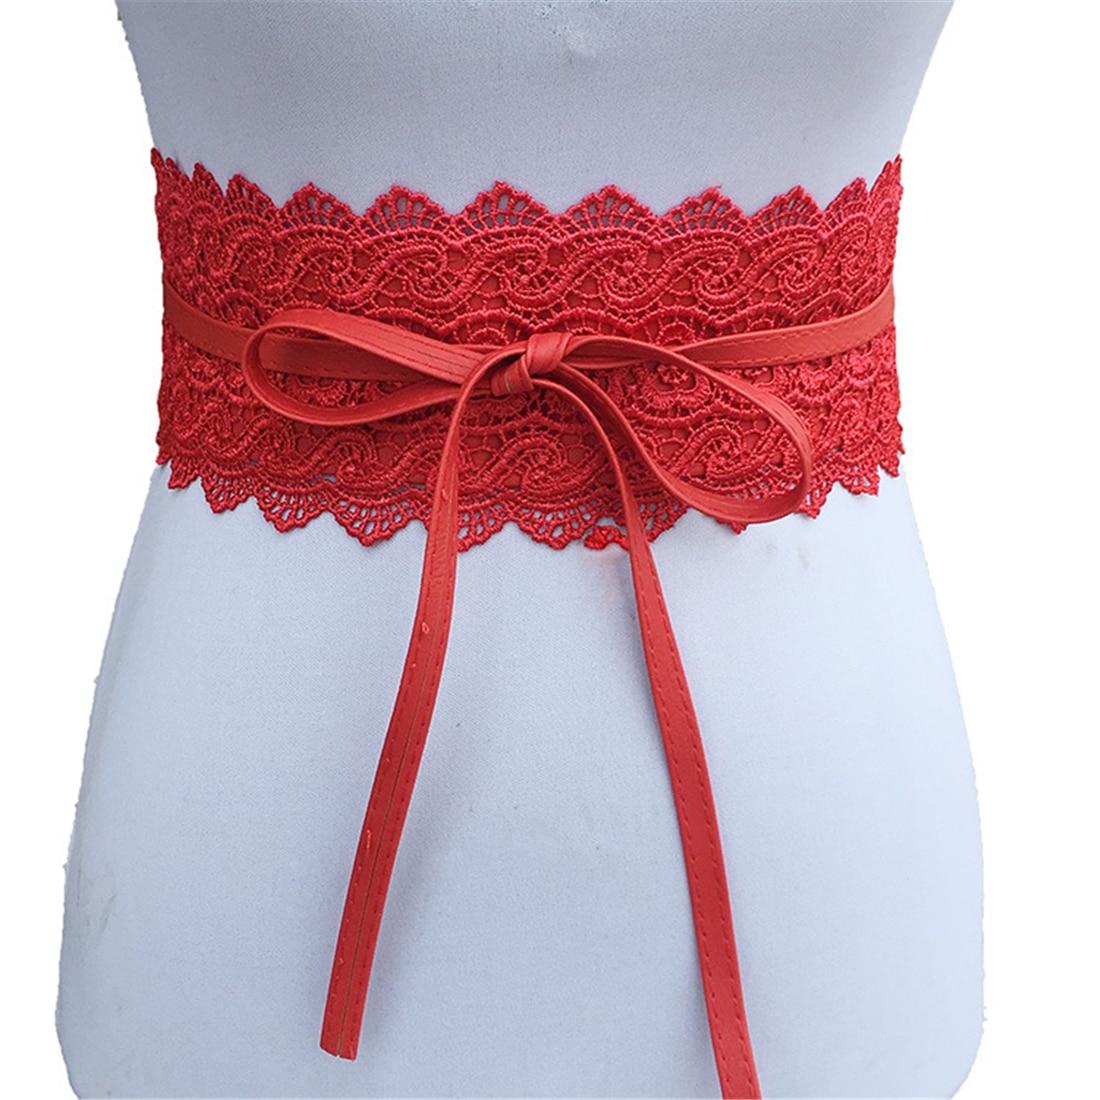 Fashion Waist Cincher Women Dress Bowknot Waist Band Faux Leather Lace Wide Decor Belt Girdle Waist Band Bandage Red White Black